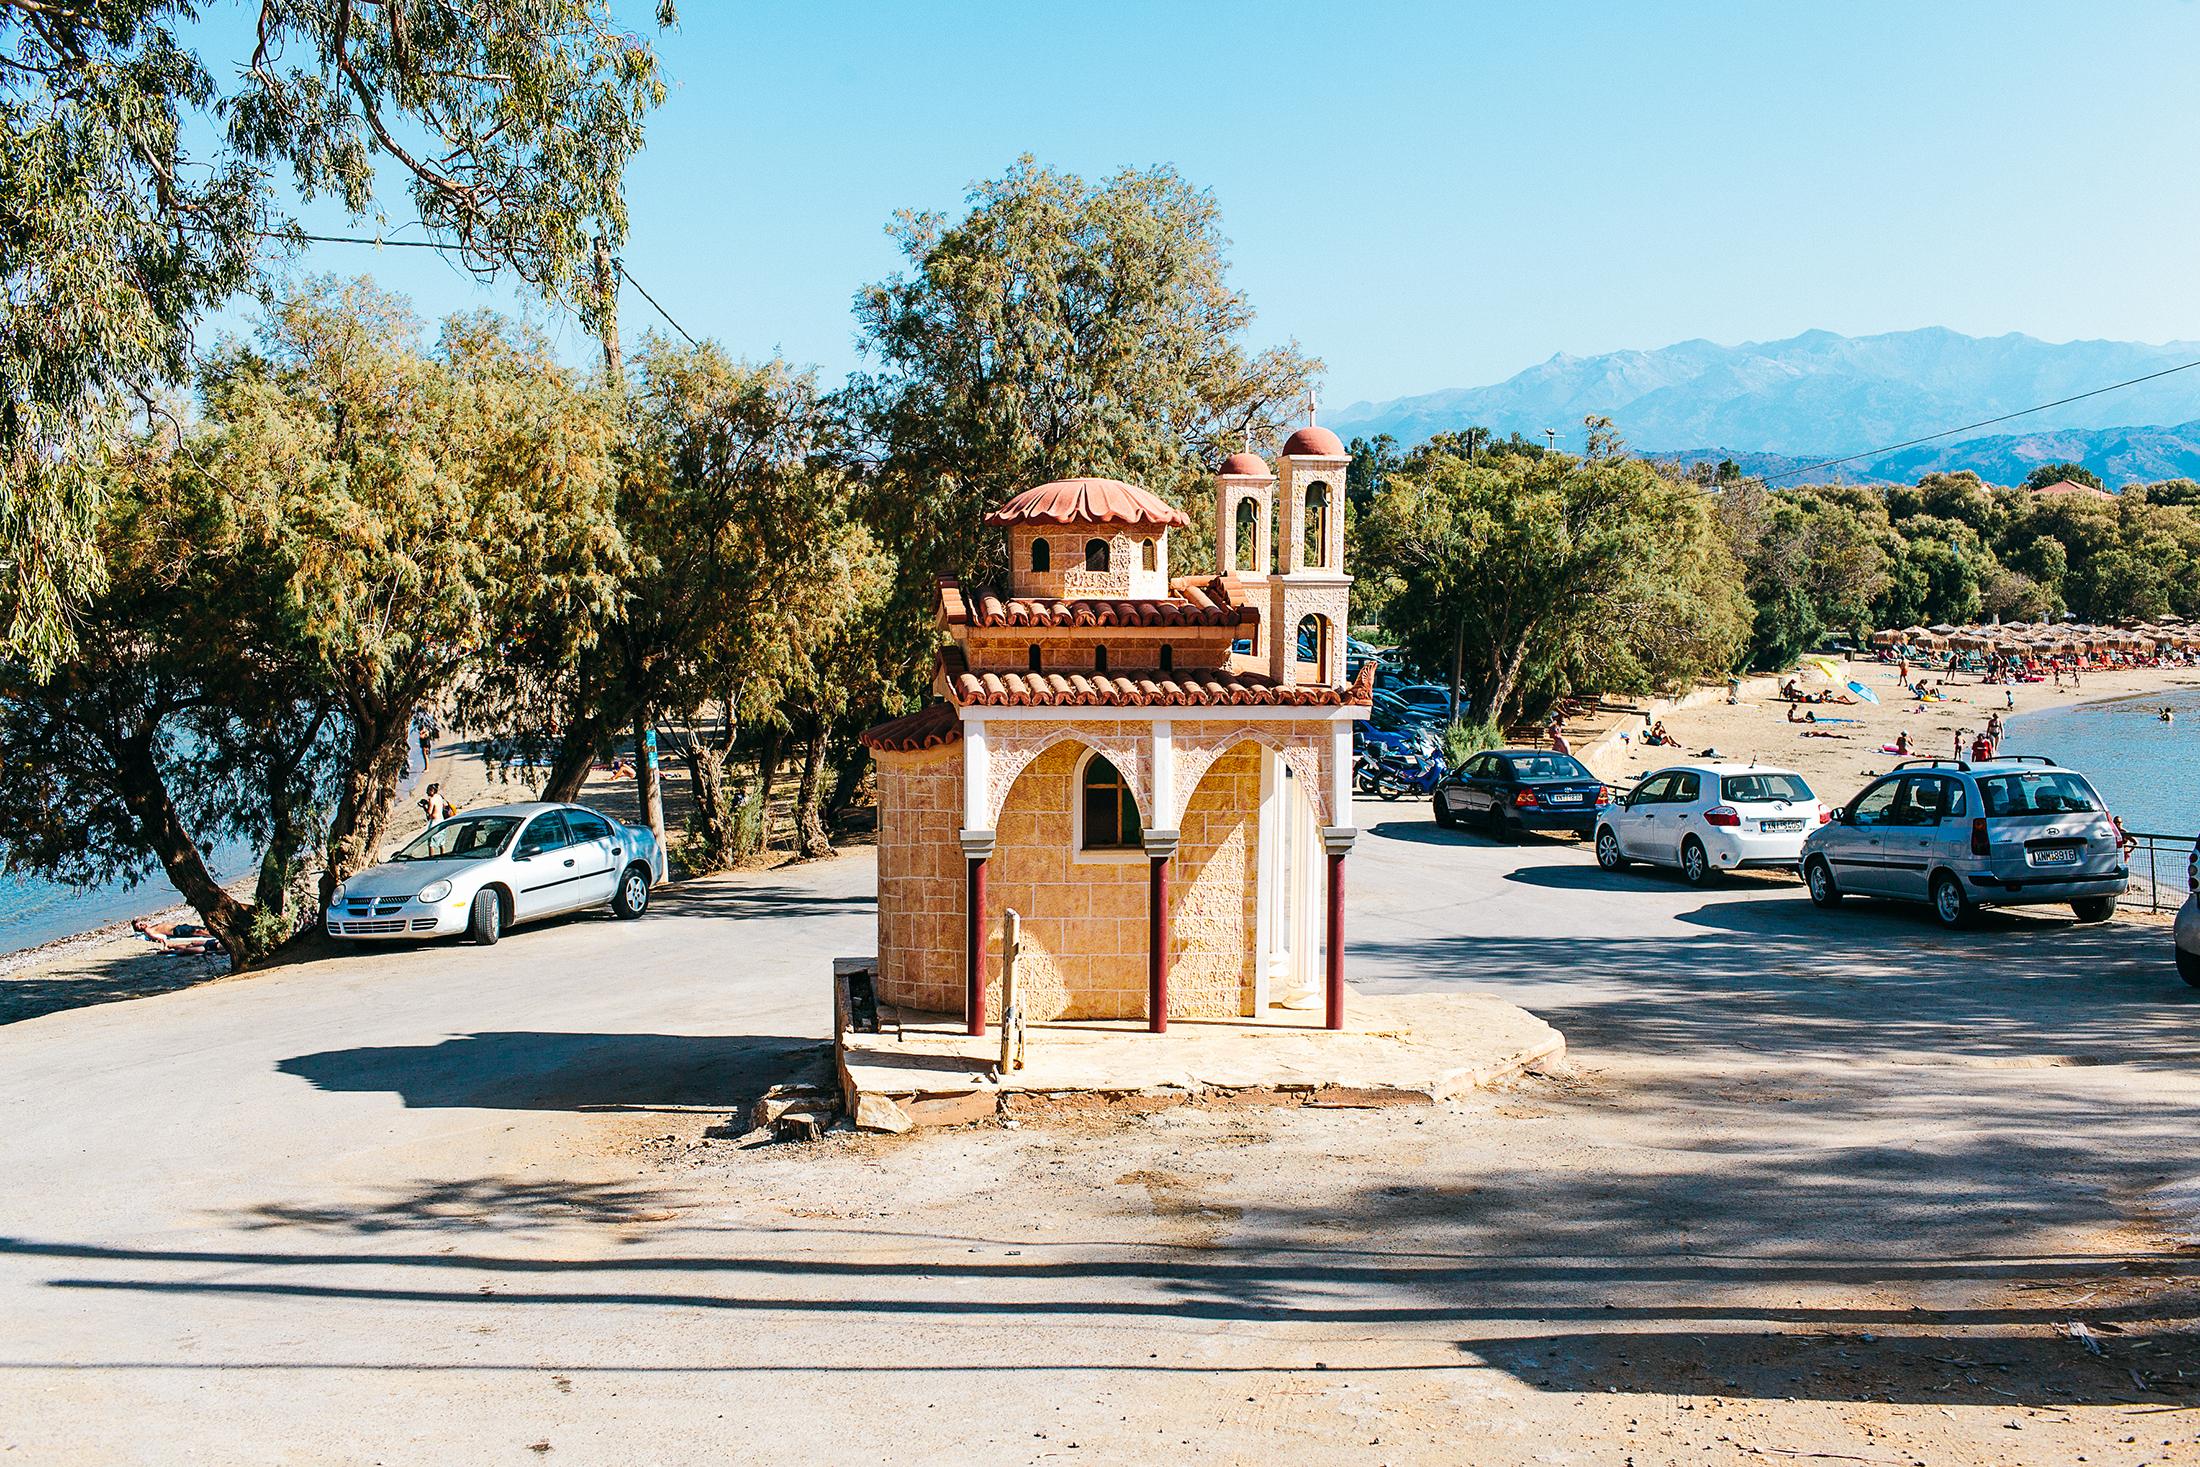 Fotodokumentar: Greske kapeller